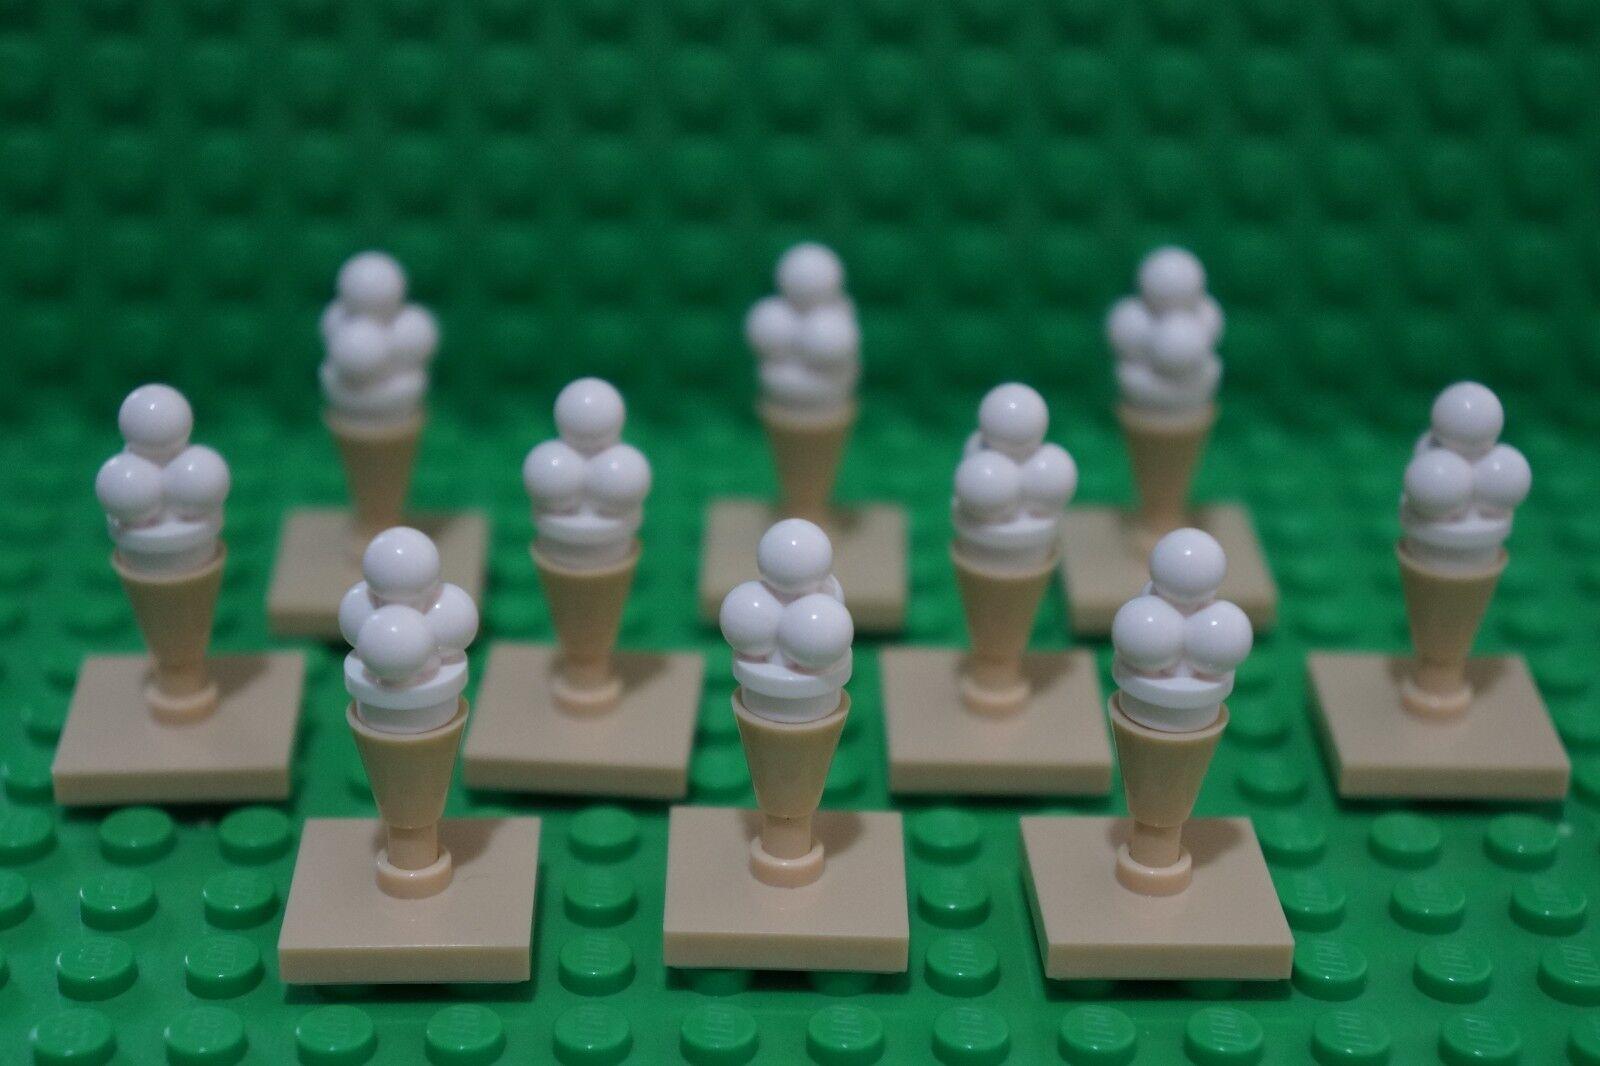 Lego Tan 1 x 1 Ice Cream Cone Brick x10 each pack *NEW* Friends City 11610